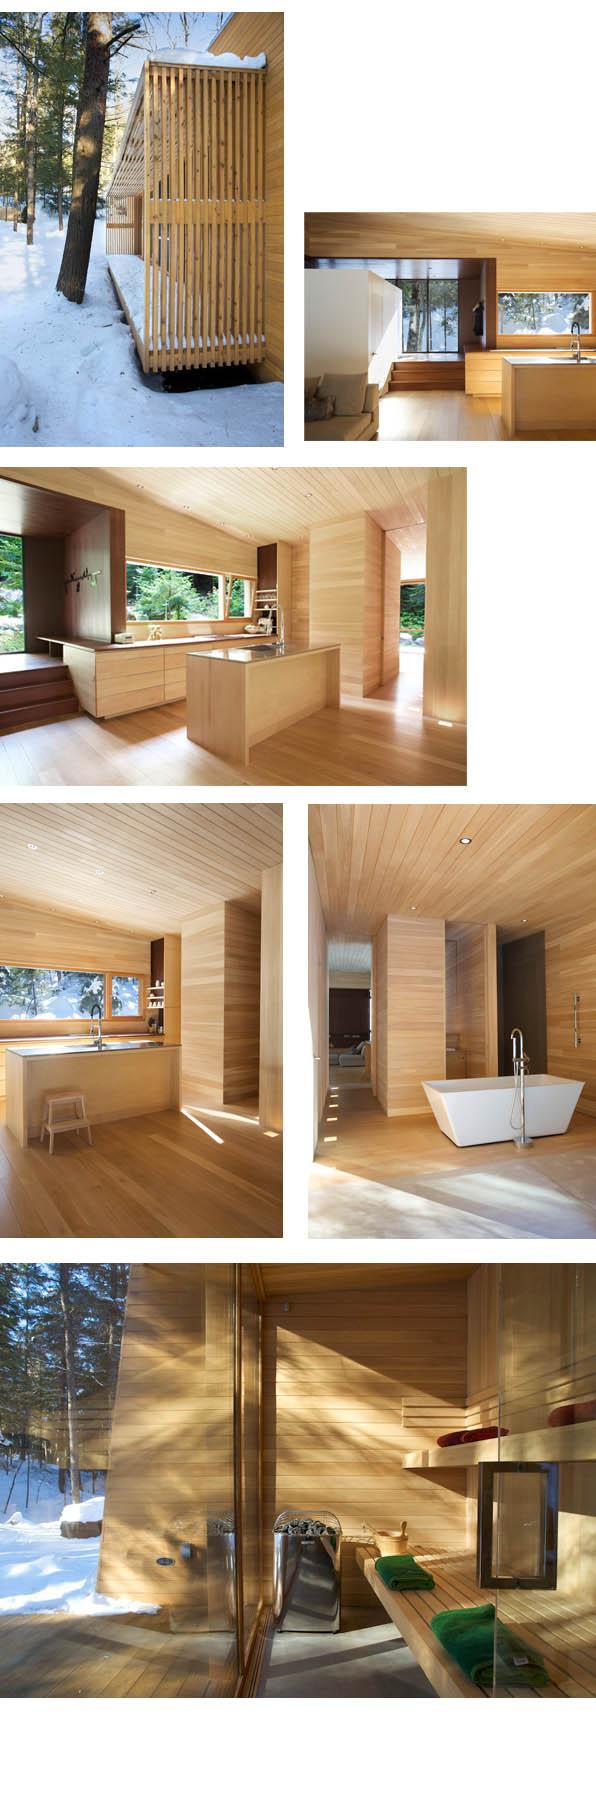 Blog de modus vivendi lunes inspirador la casita del - Tocar madera casas ...